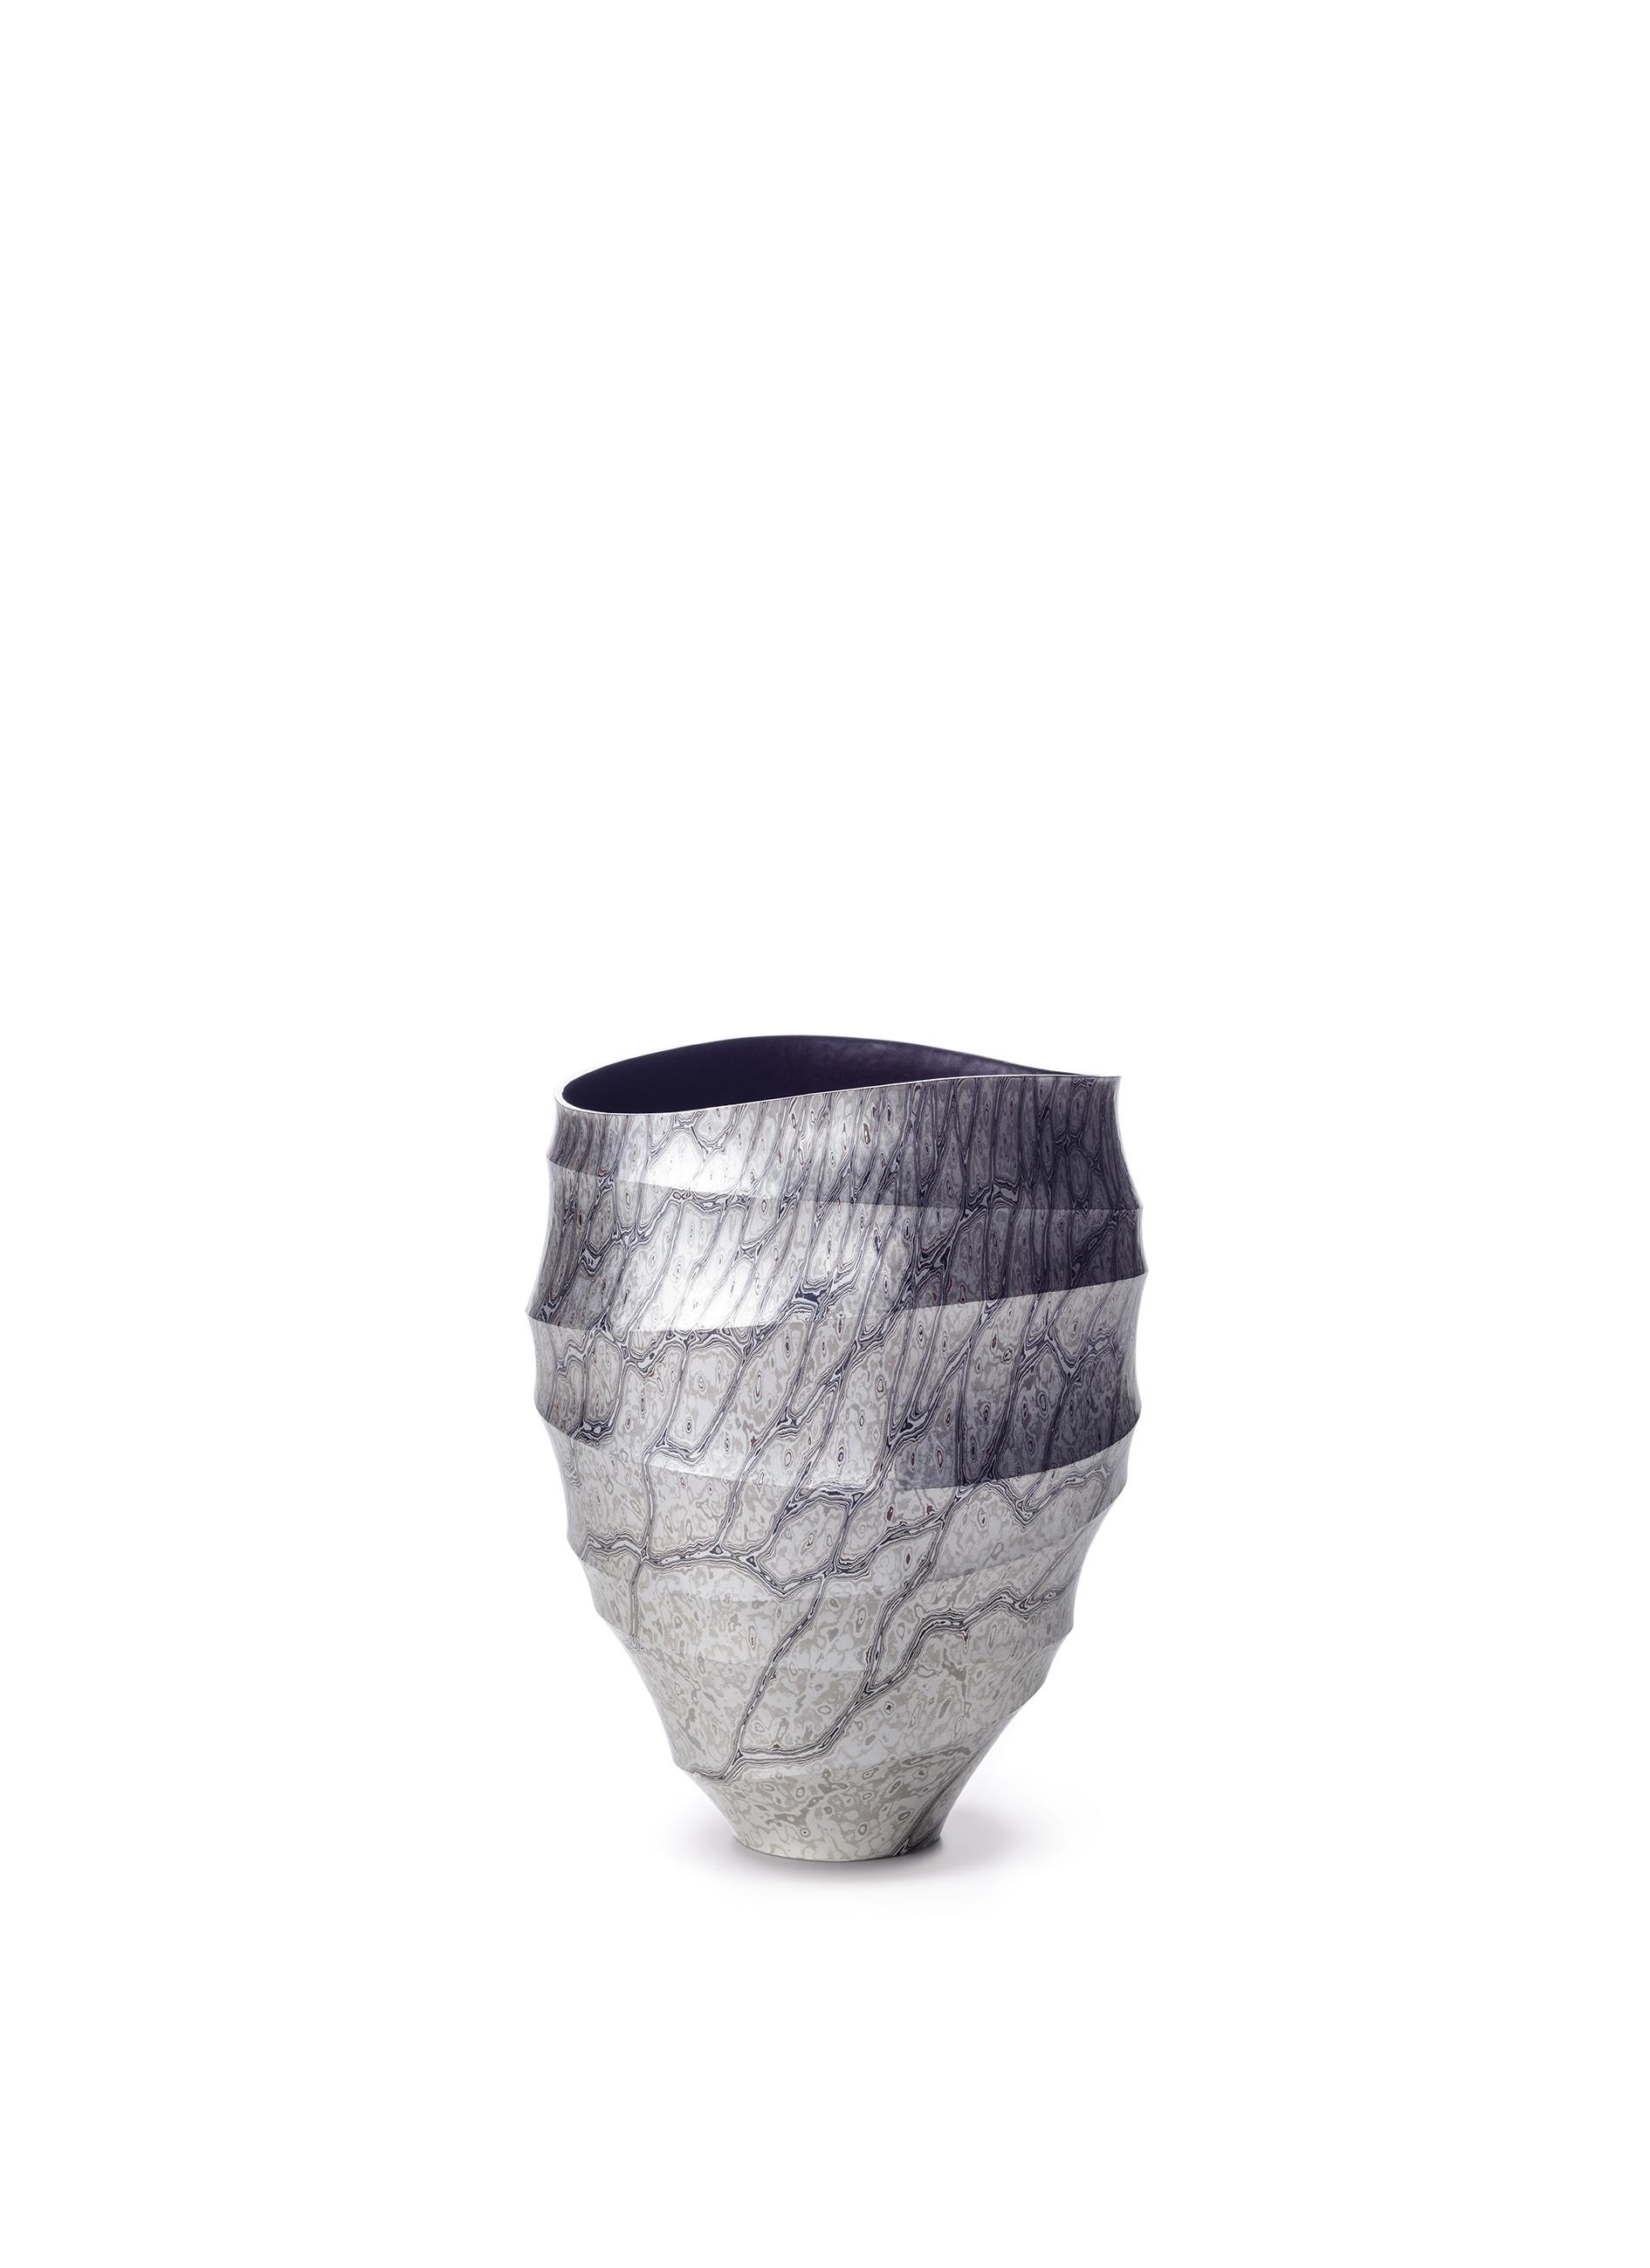 "Ryuhei Sako, Japan ""Mokume-gane Vase"", silver, copper, syakudo, shibuichi, kuromido, 163 x 155 x 213 mm (2017)"